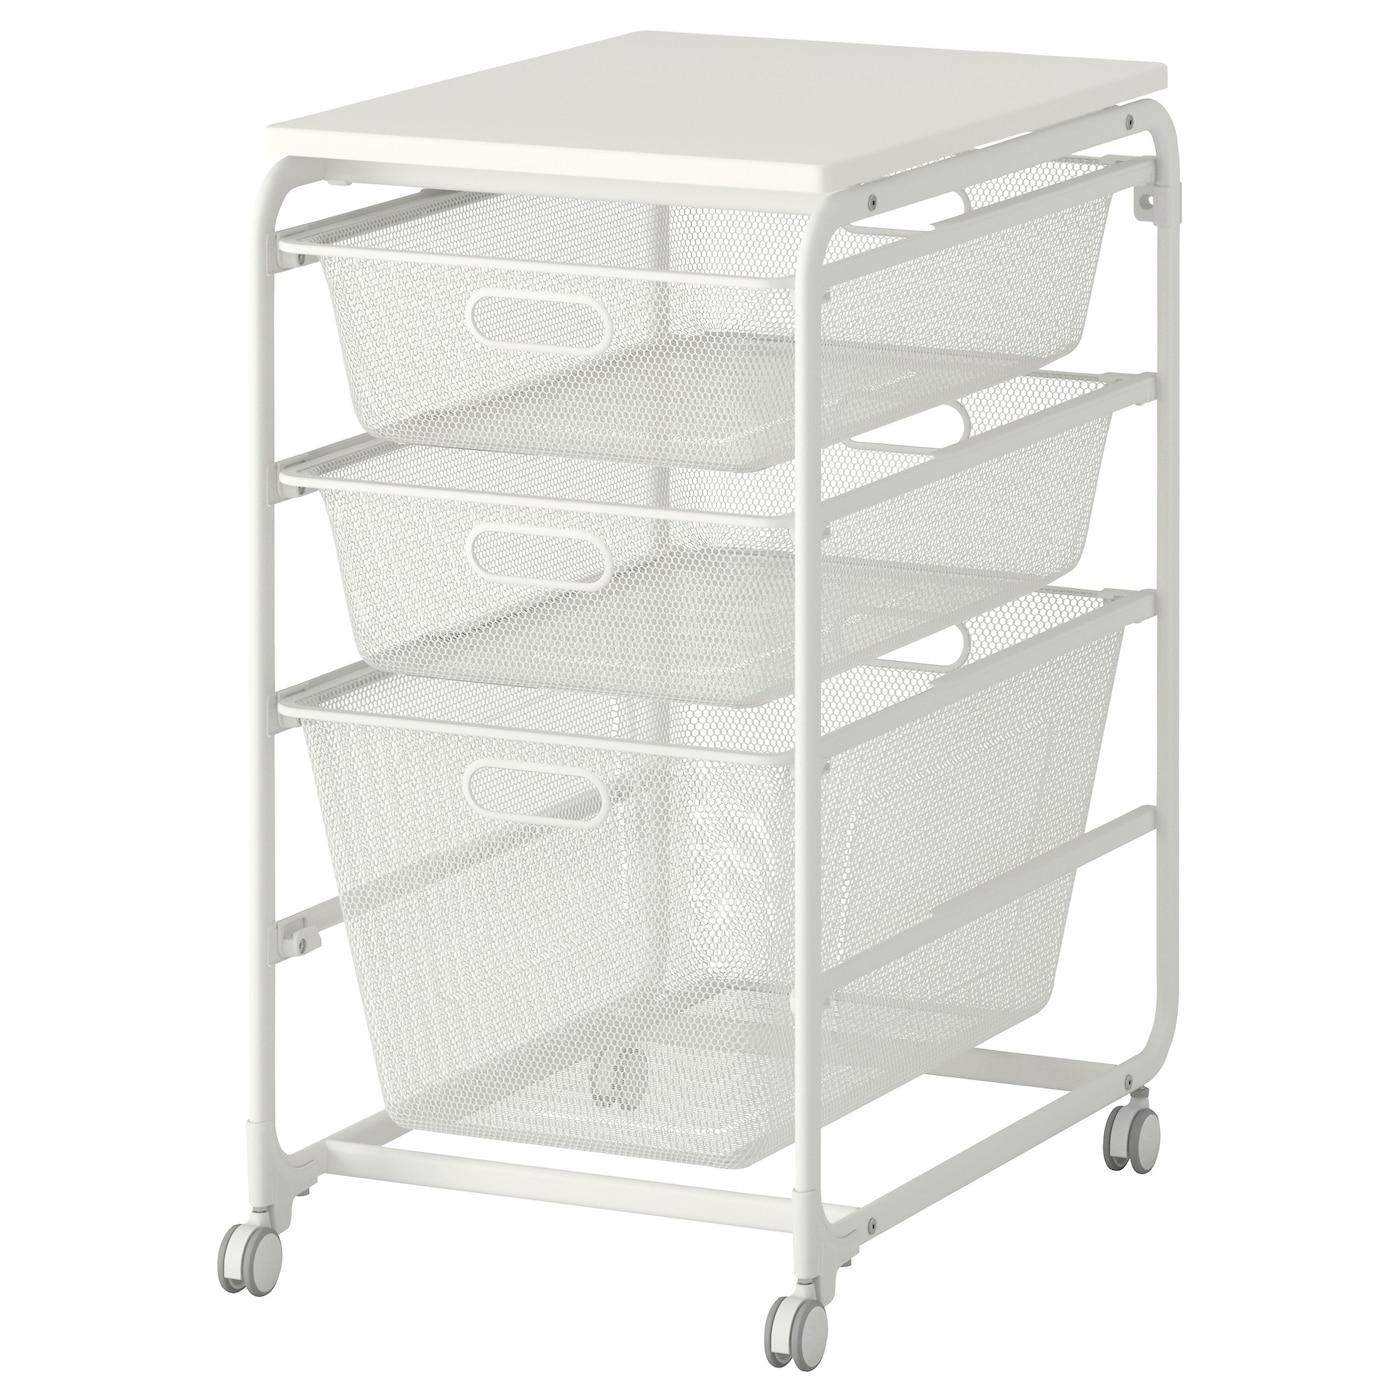 Basket & frame storage